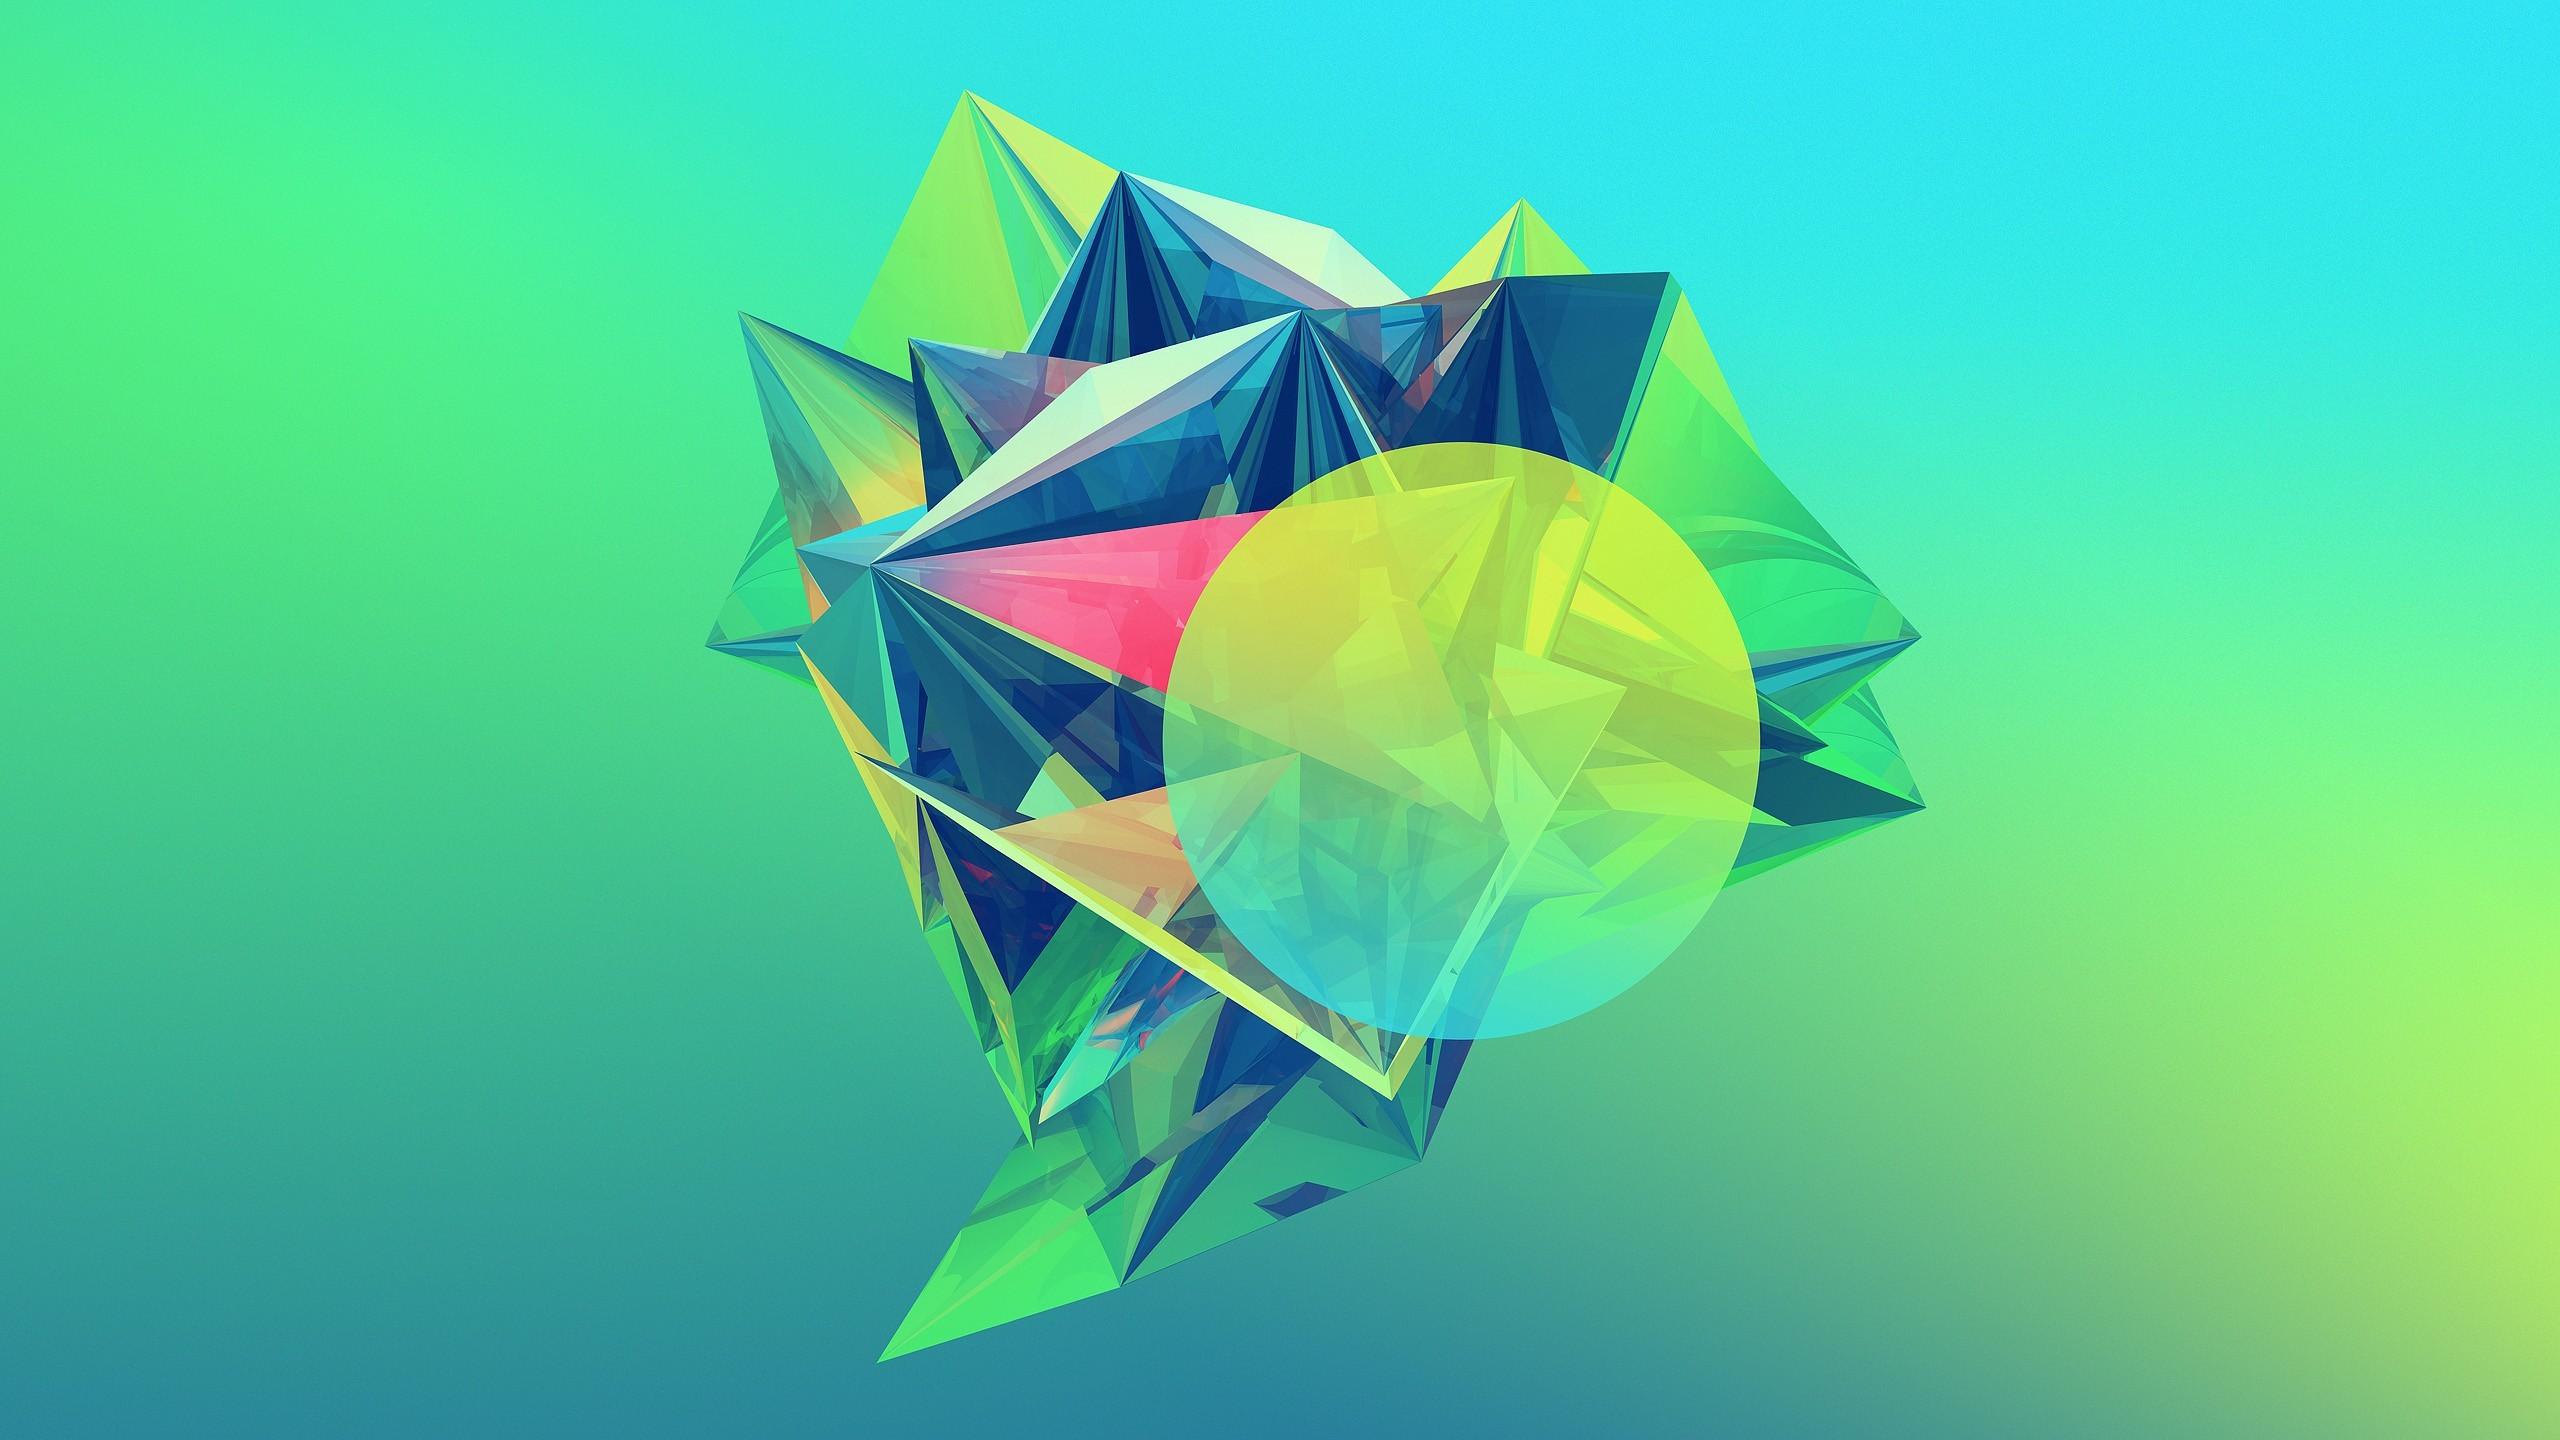 crystaline-geometry.jpg (2560×1440) | Backs | Pinterest | Photography  projects